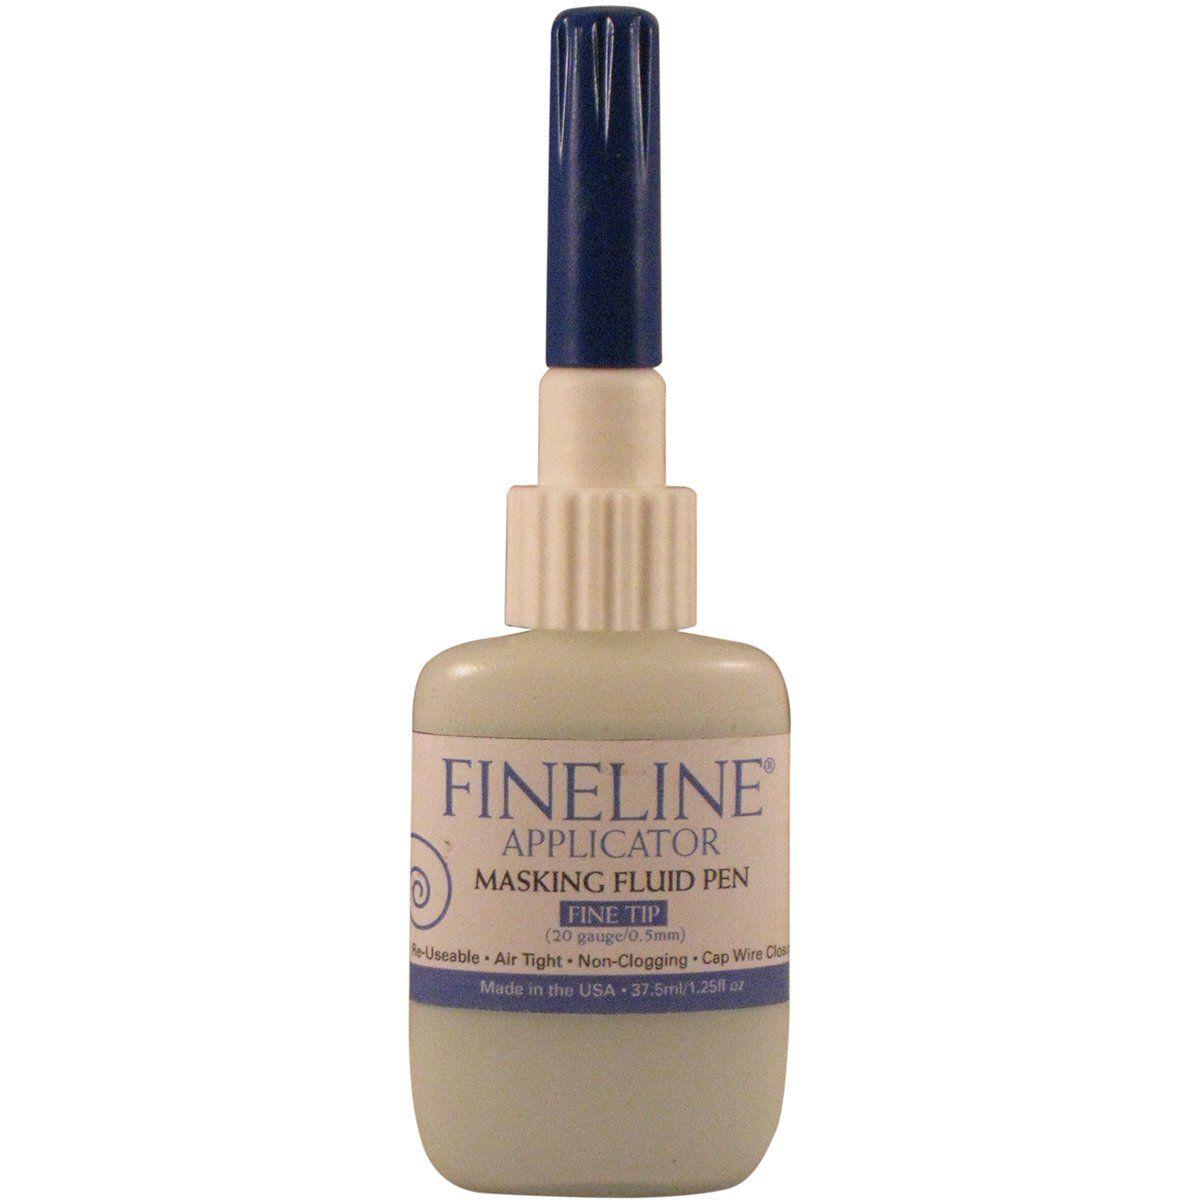 Amazon.com - Fineline Masking Fluid Pen 20 Gauge W/Masking Fluid, 1.25 Ounces - Automotive Applicator Tools